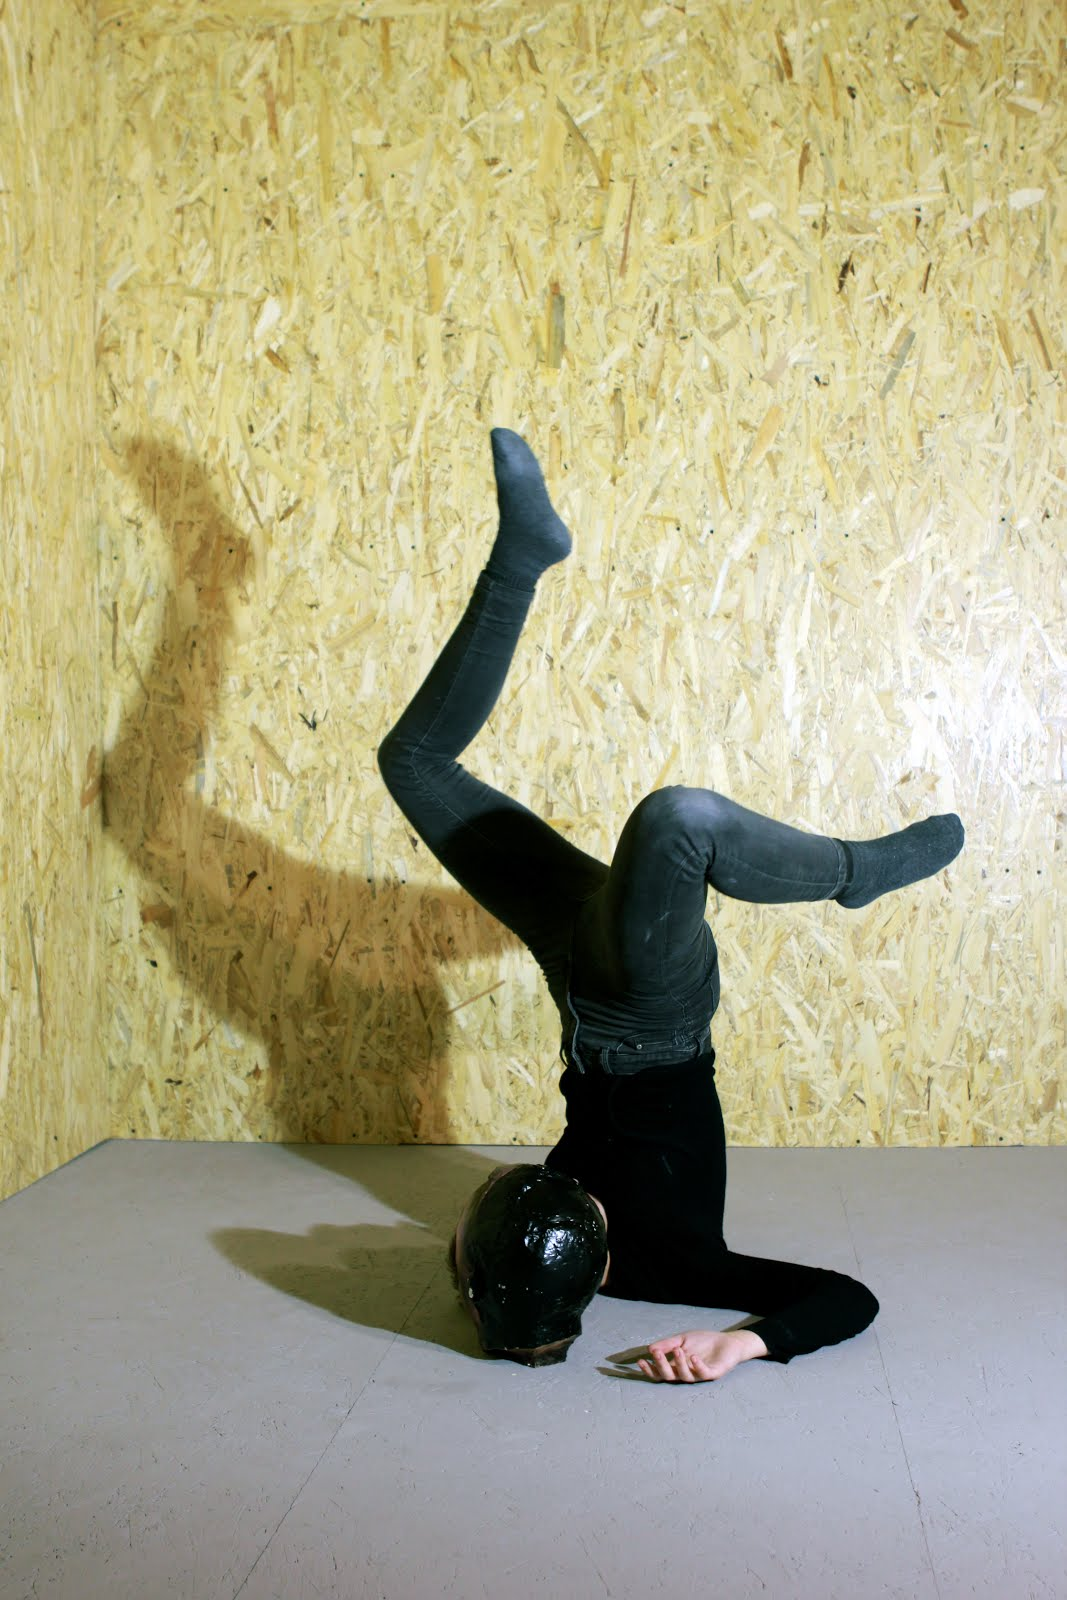 Exhibit 2 (Dancer - Ema Crnić)